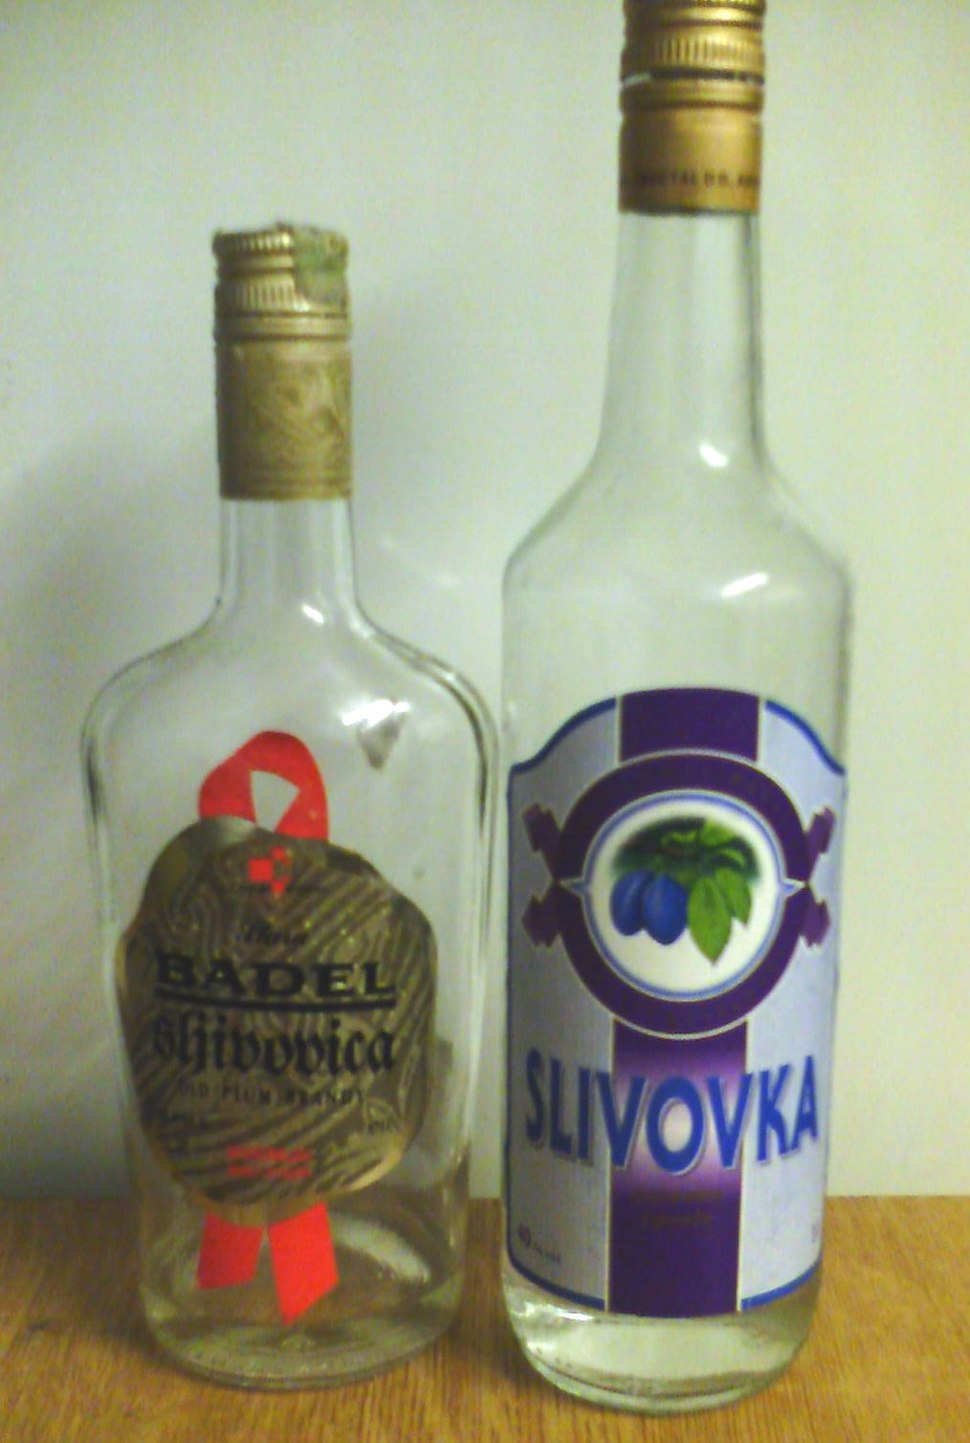 Slivovka